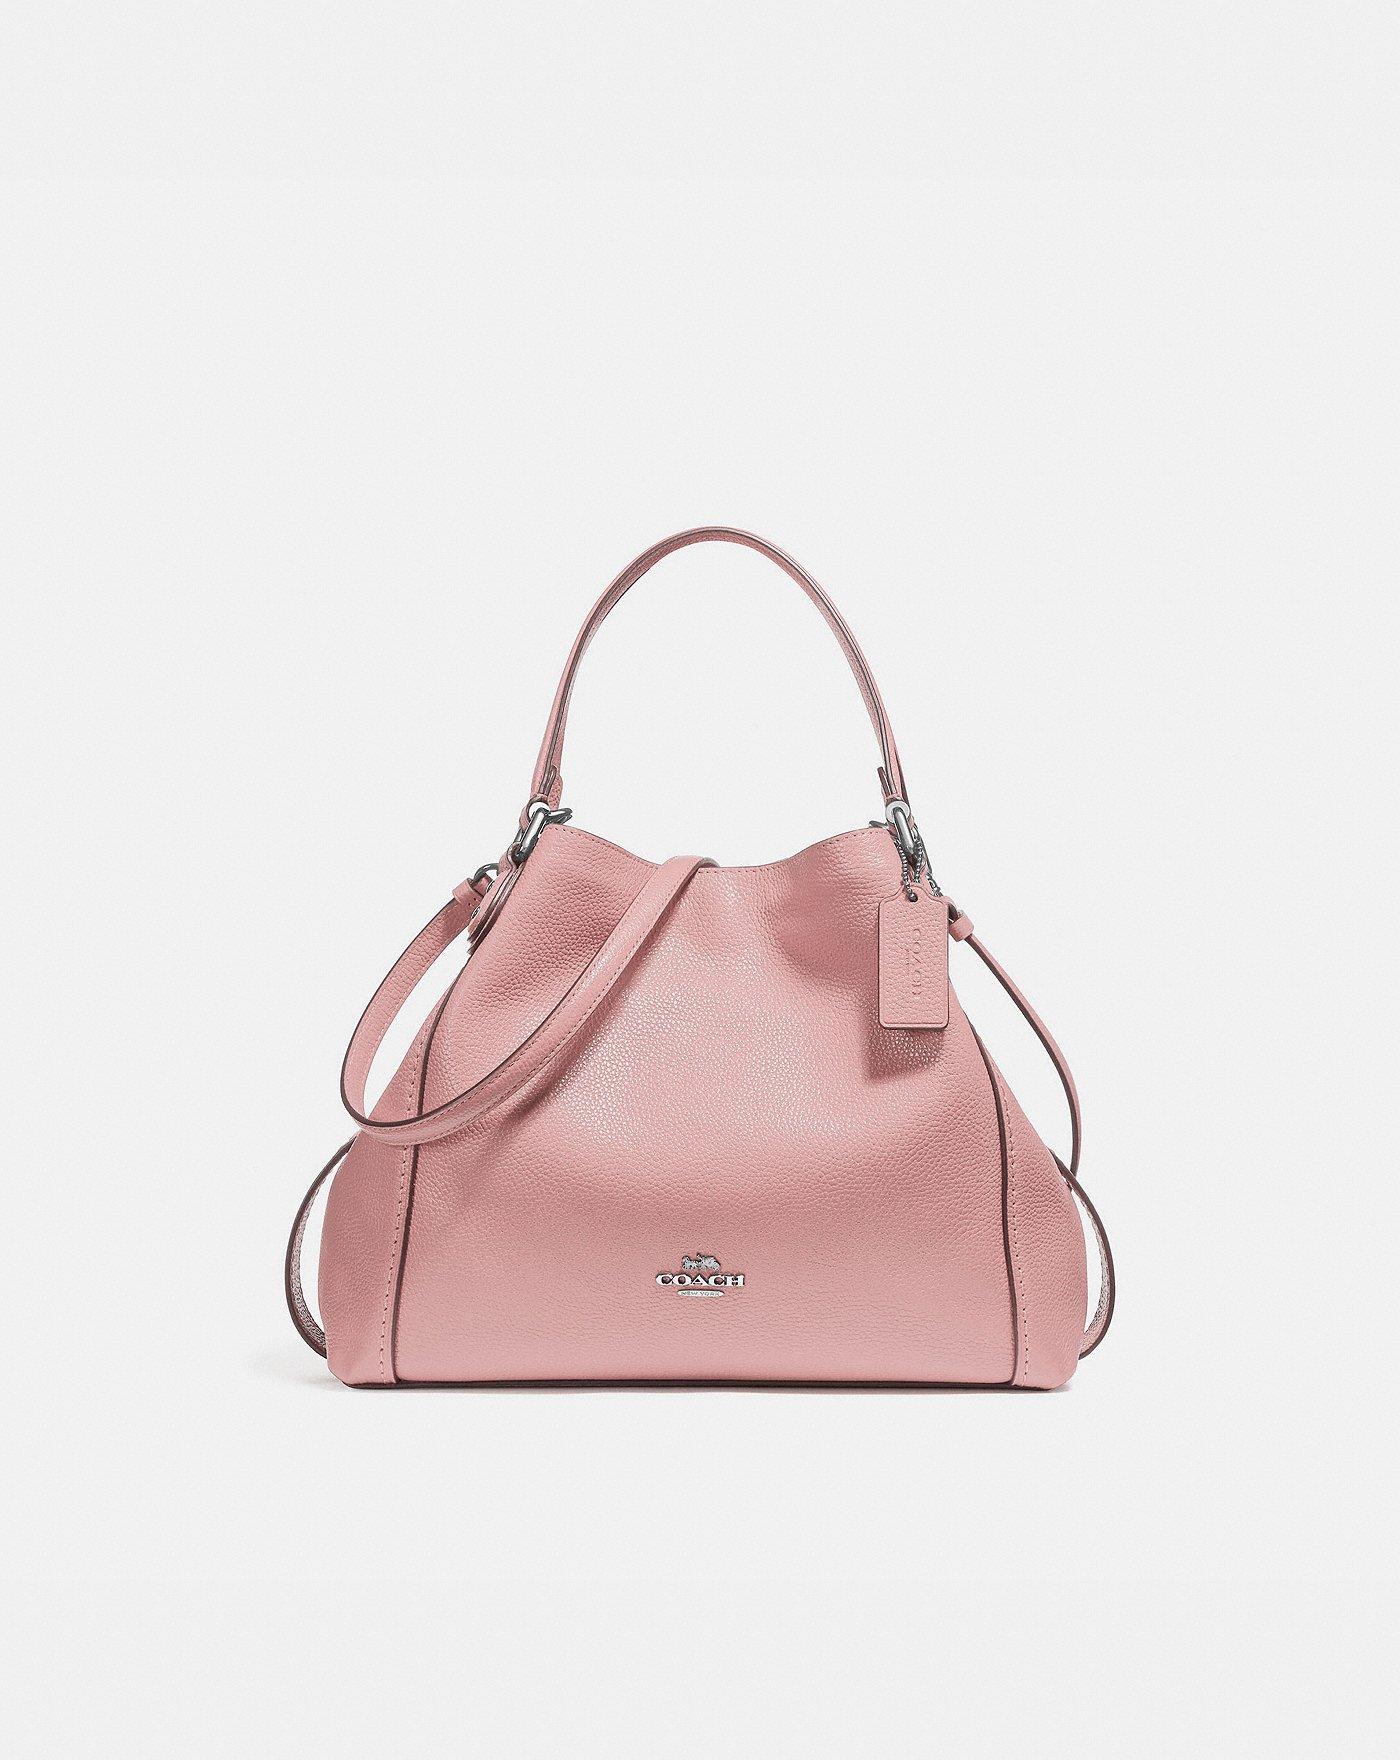 COACH  Edie Shoulder Bag 28 4db9bfad01d80